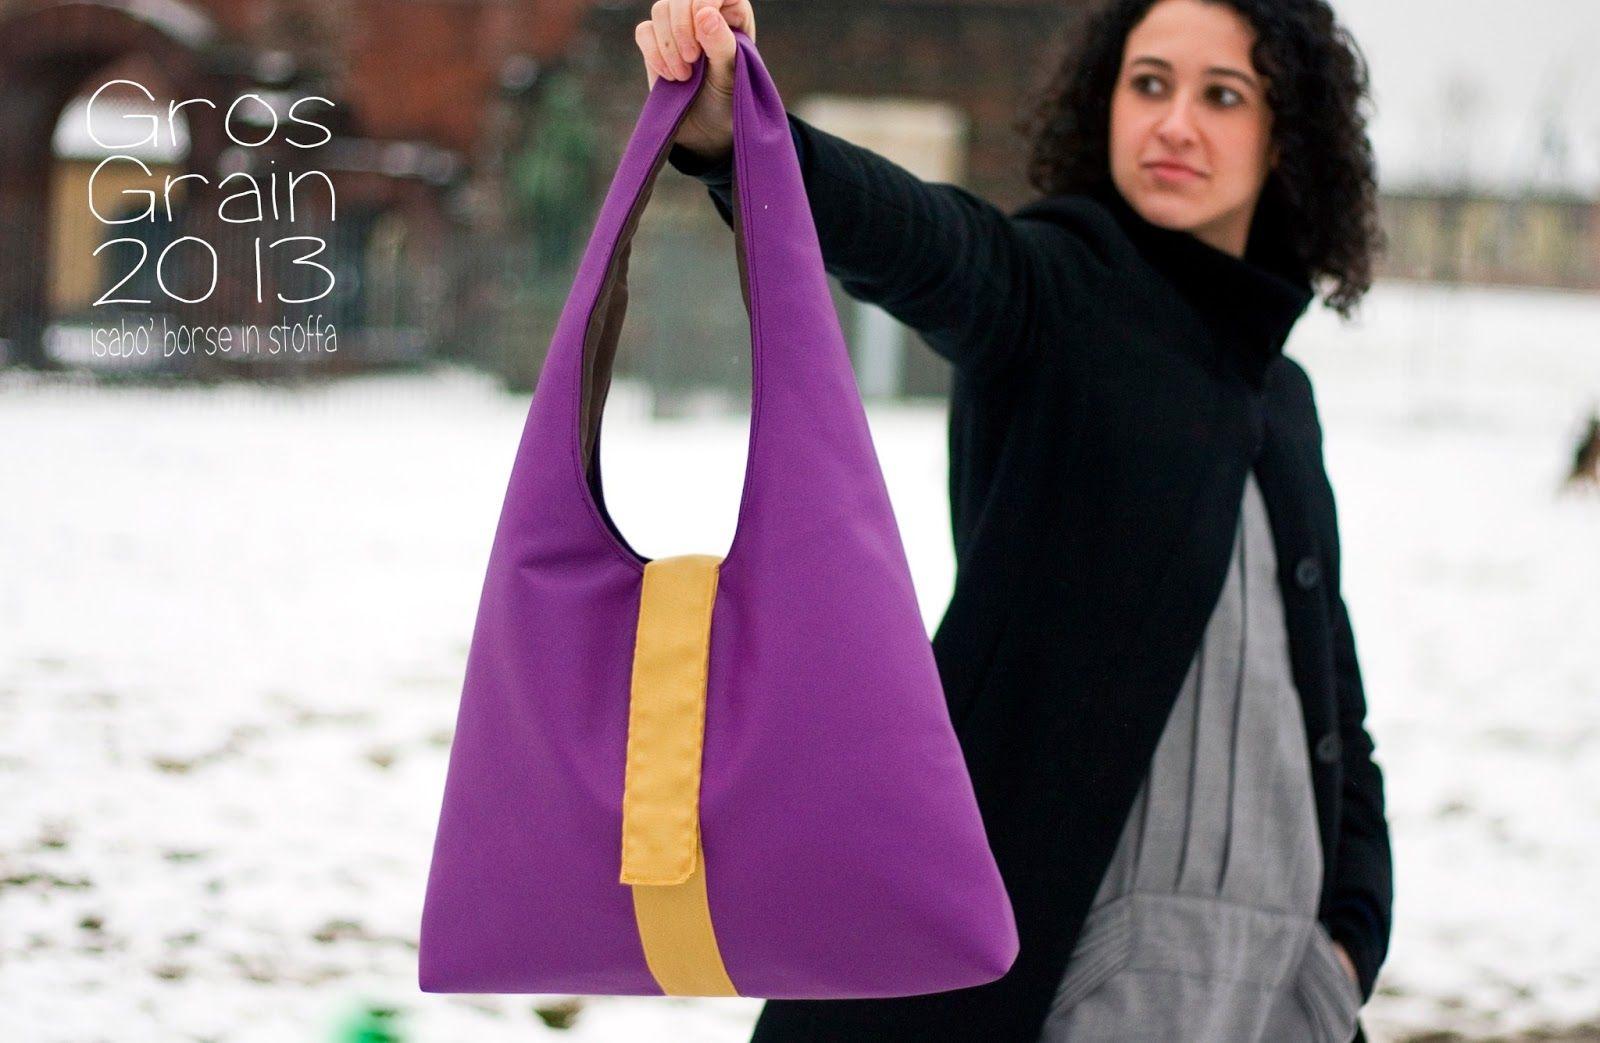 Isabo borse in stoffa: gros grain in ecopelle viola borse pinterest